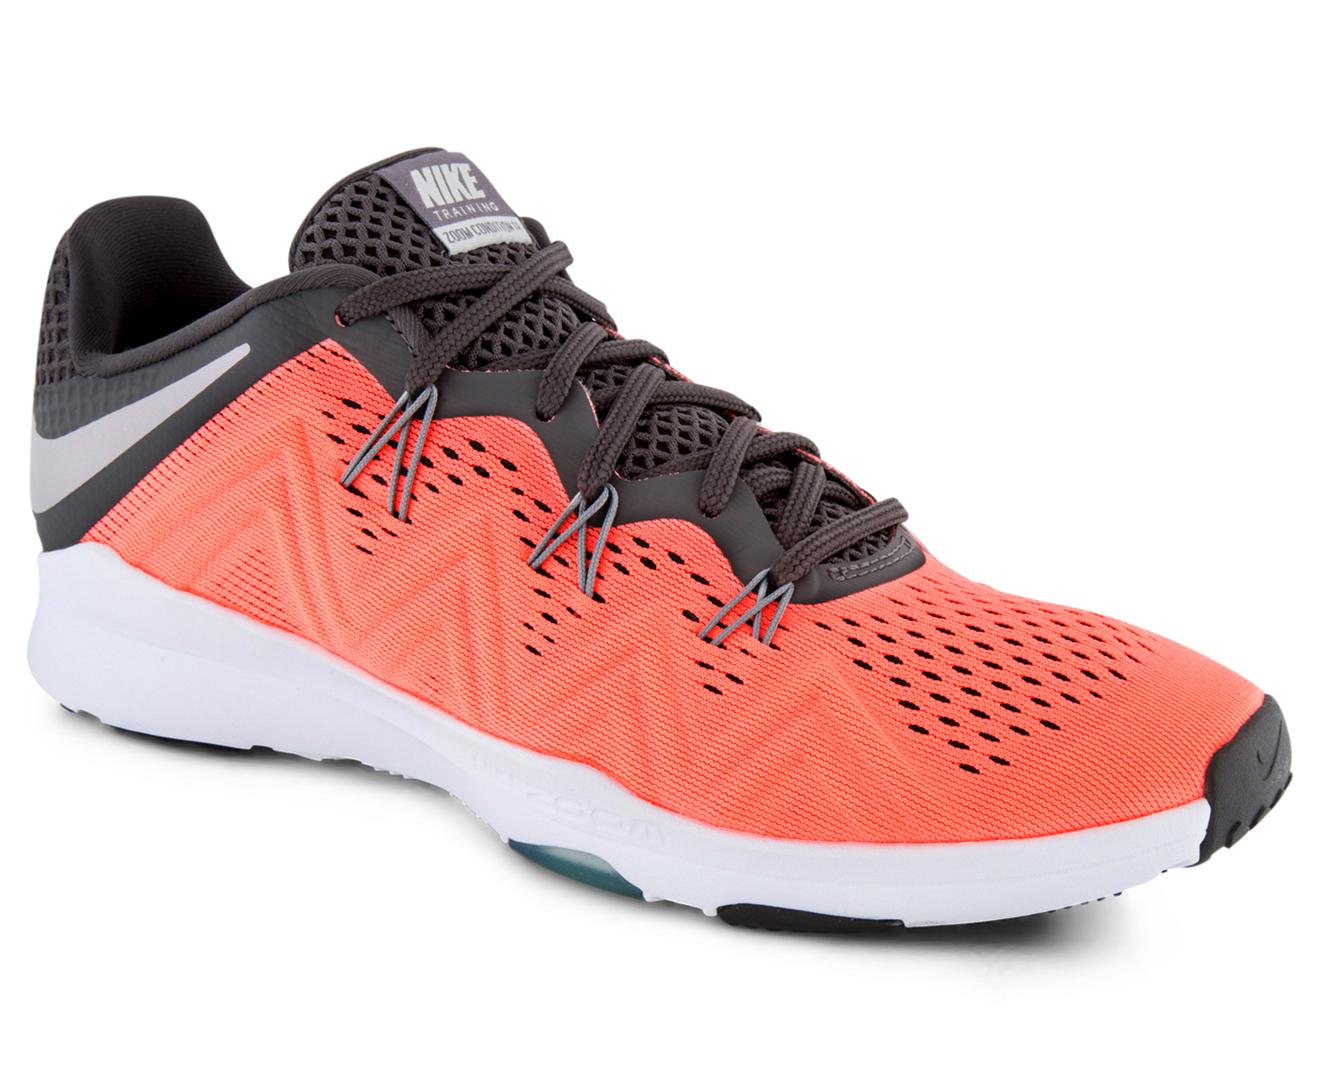 3237cc063472 Nike Women s Zoom Condition Shoe - Lava Glow Matte Silver